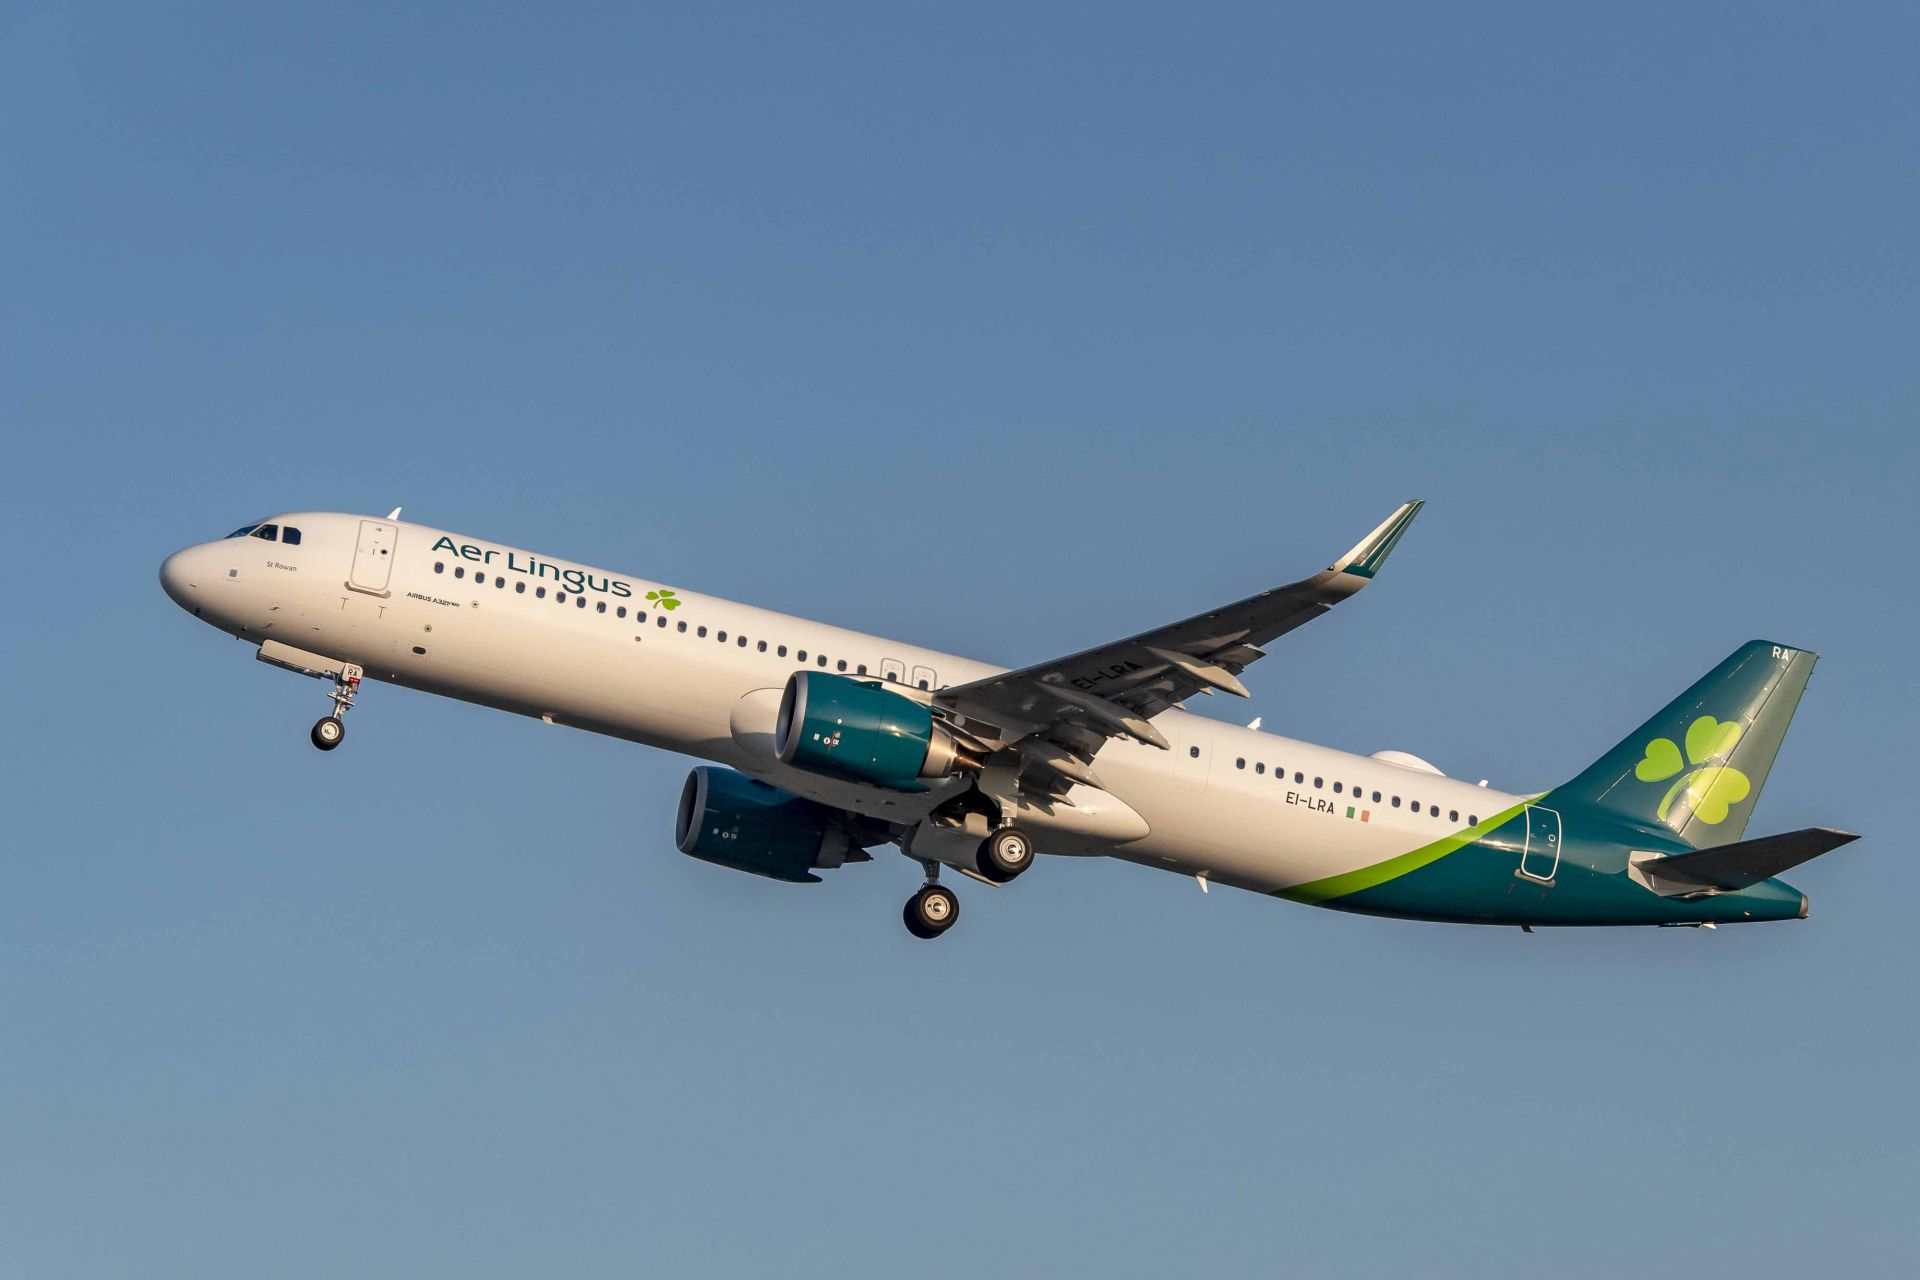 A321LR společnosti Aer Lingus. Foto: Airbus